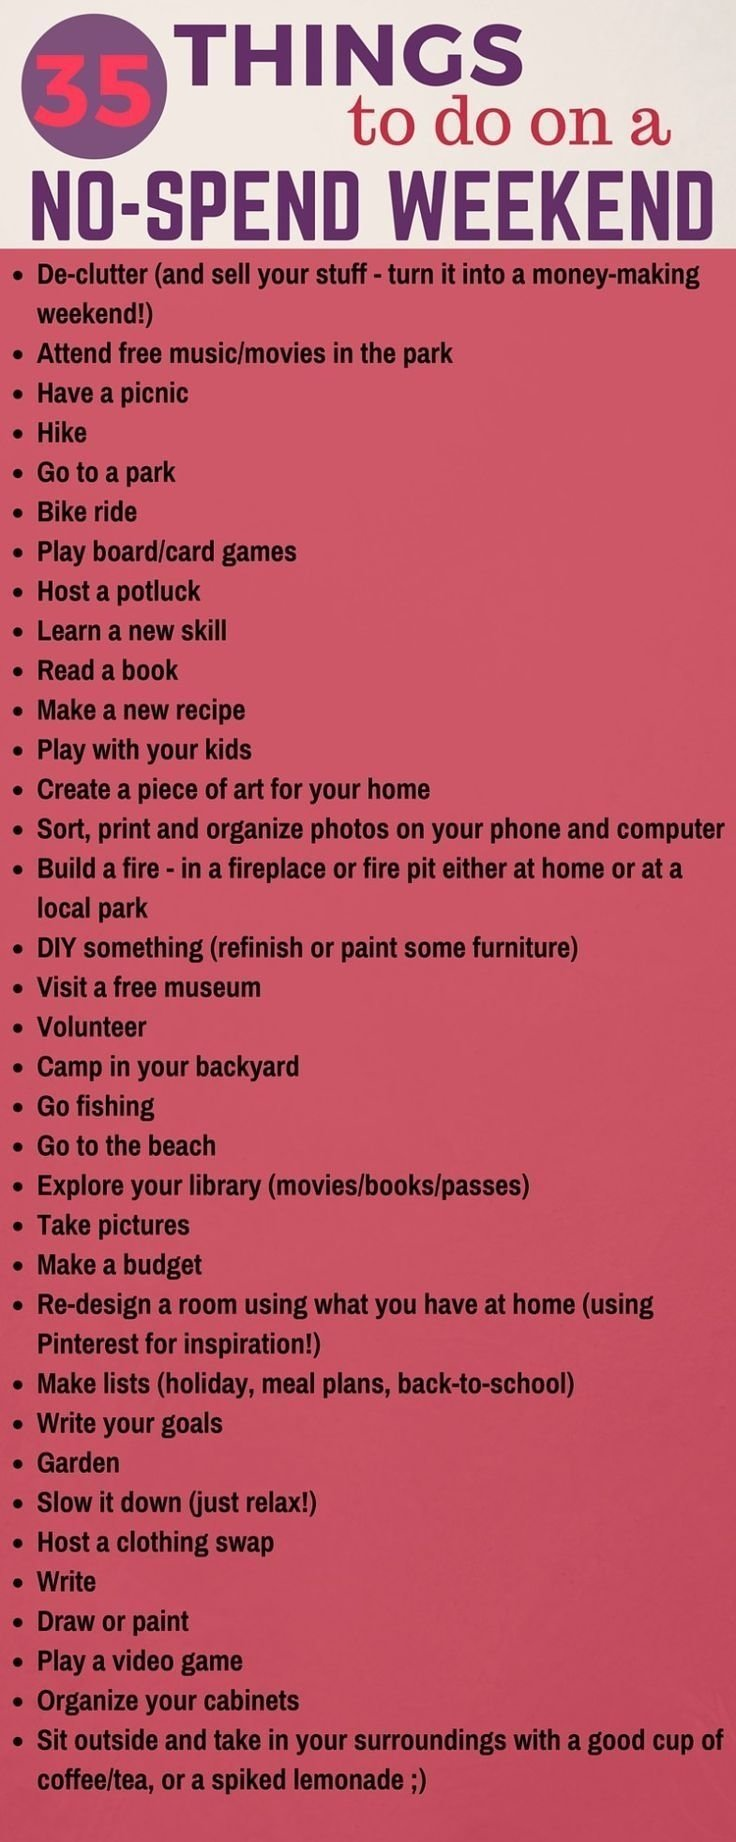 10 awesome fun date ideas your boyfriend